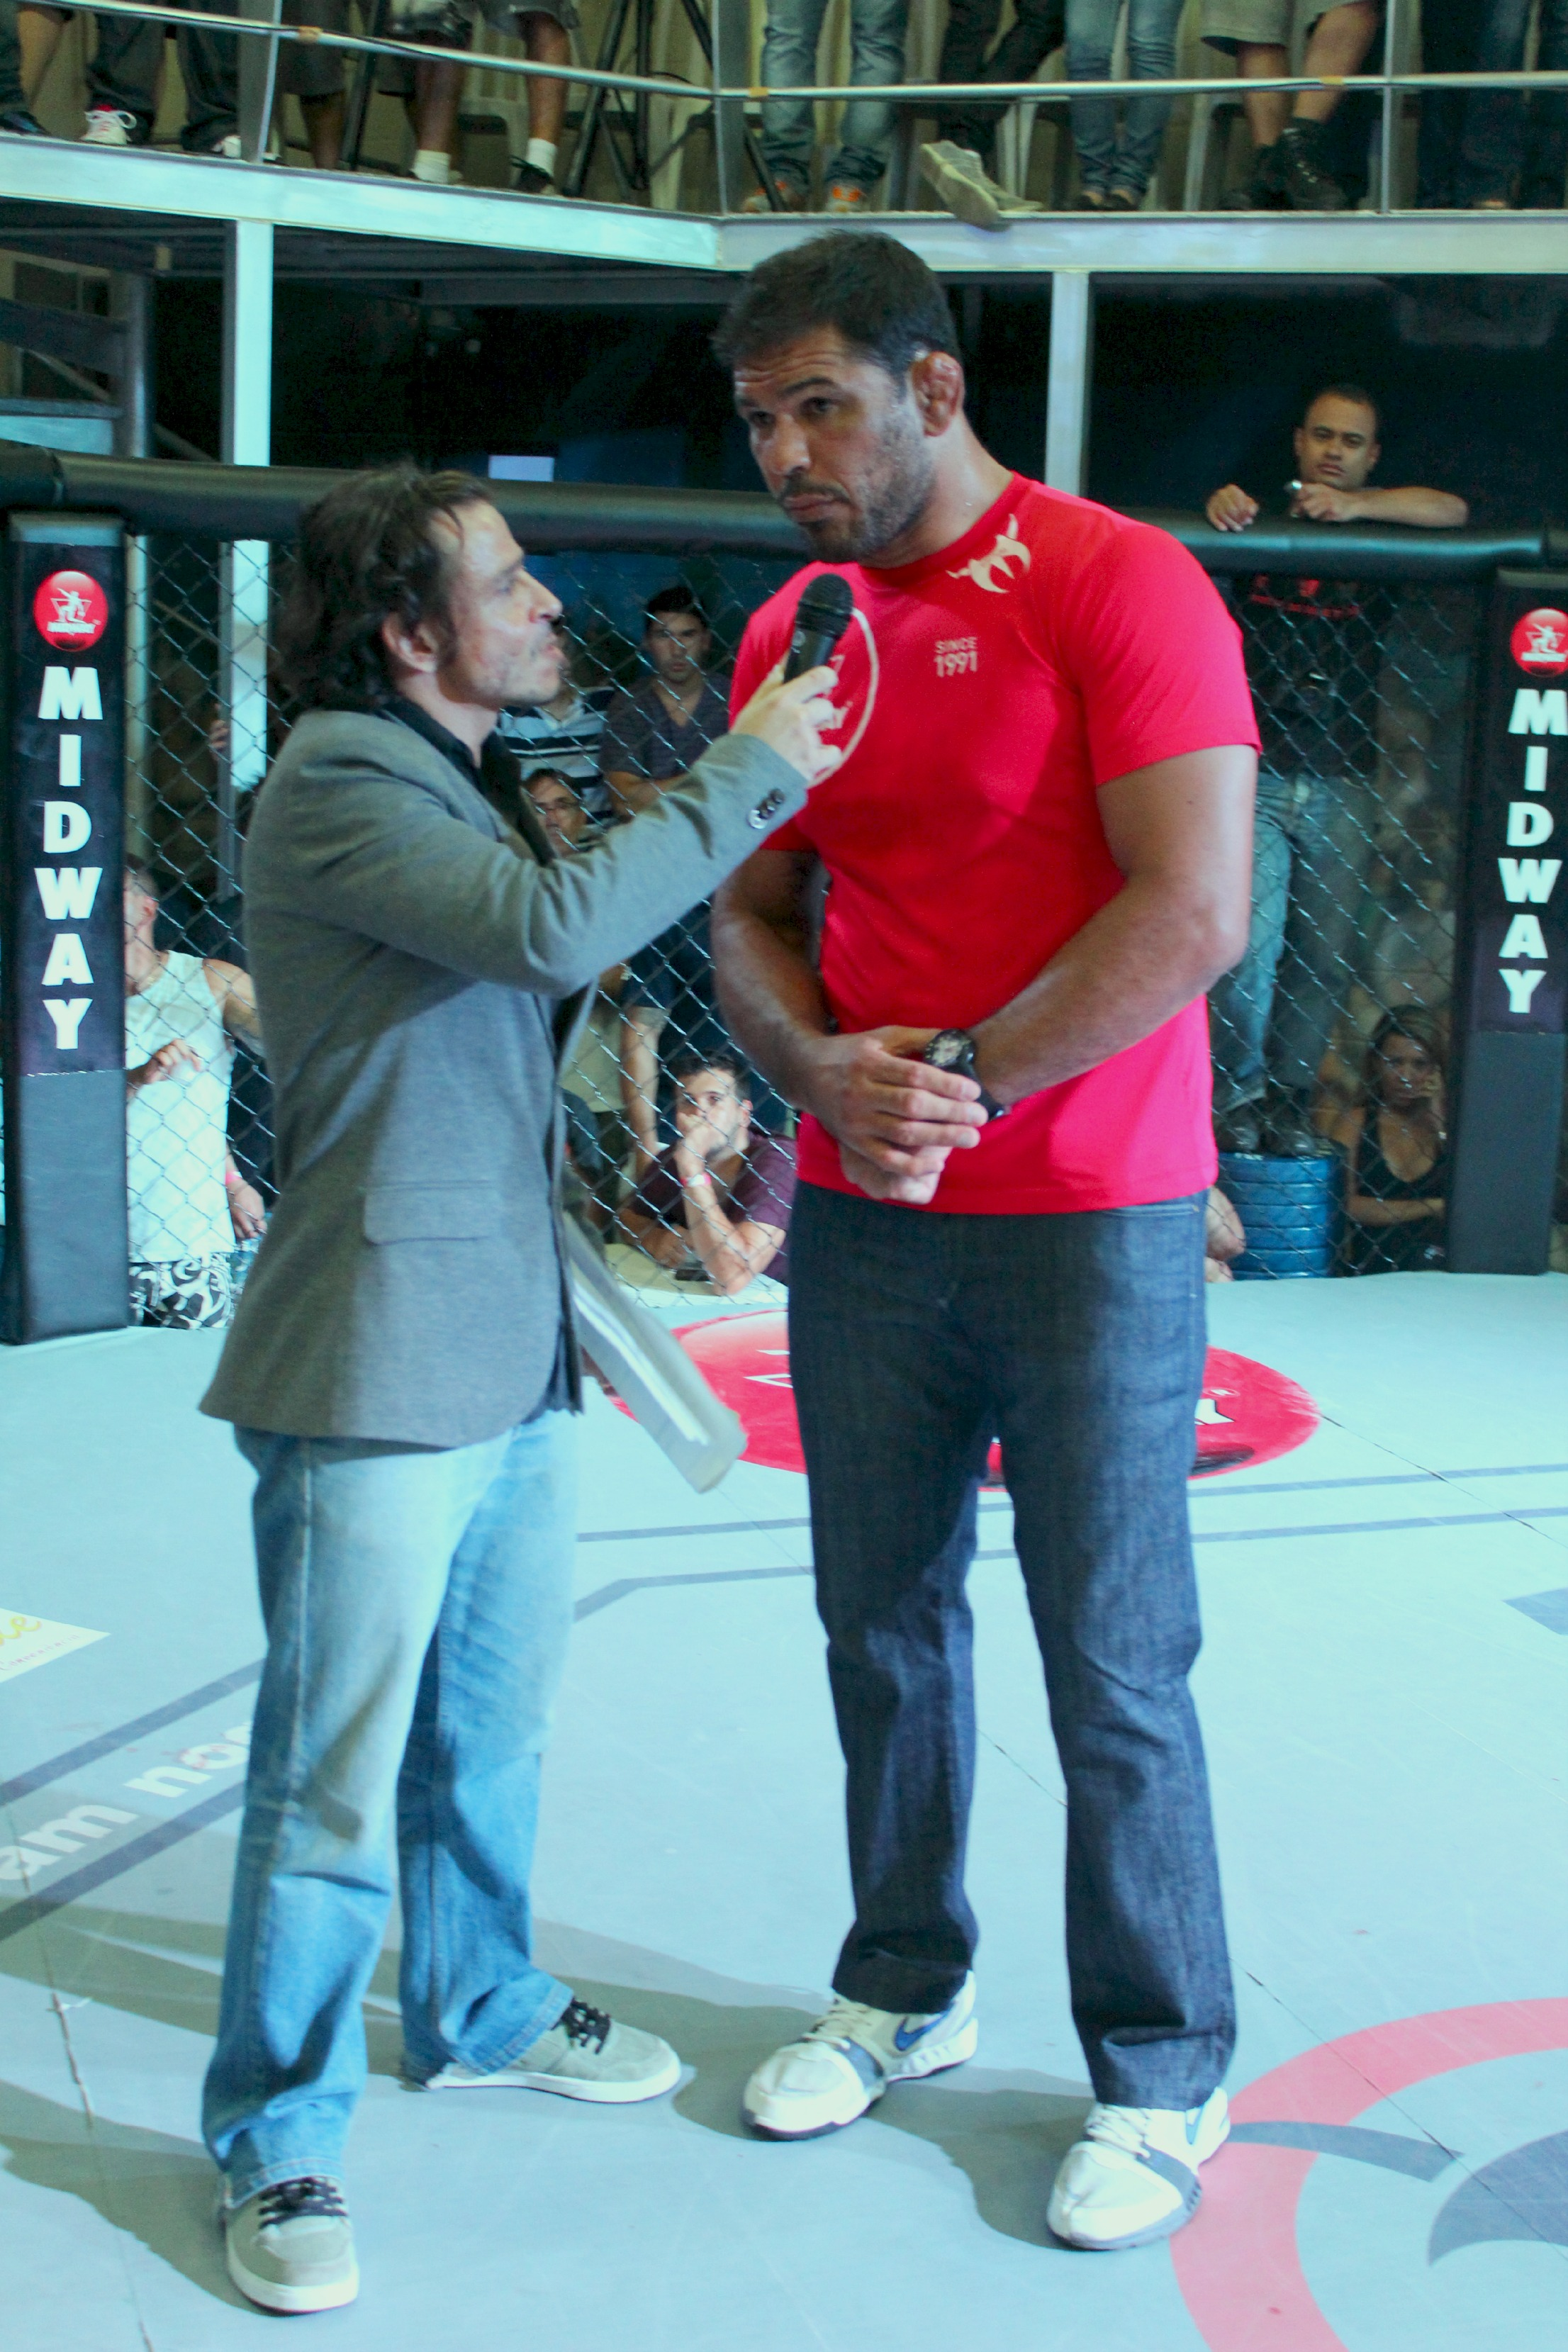 Minotauro promete lutas femininas no seu Circuito. Foto: Leonardo Fabri/Chave de Braço